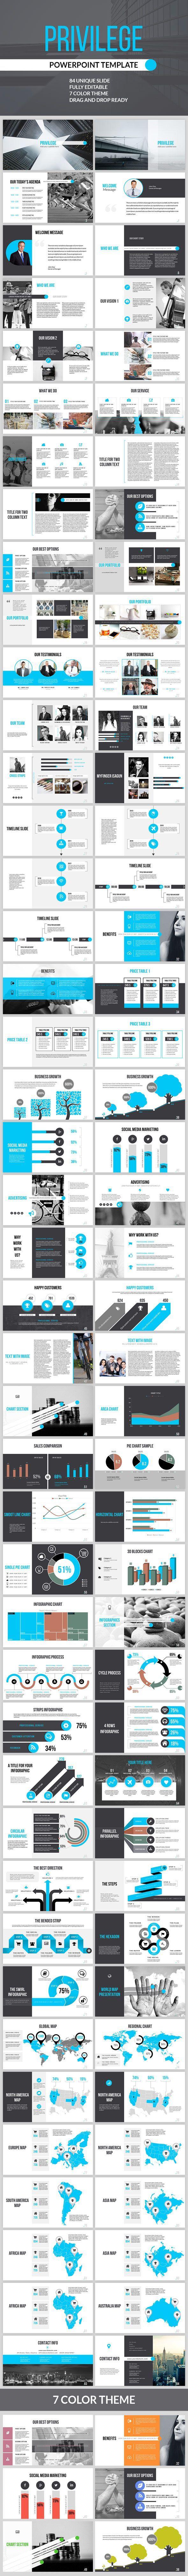 Privilege - Multipurpose PowerPoint Presentation (PowerPoint Templates)